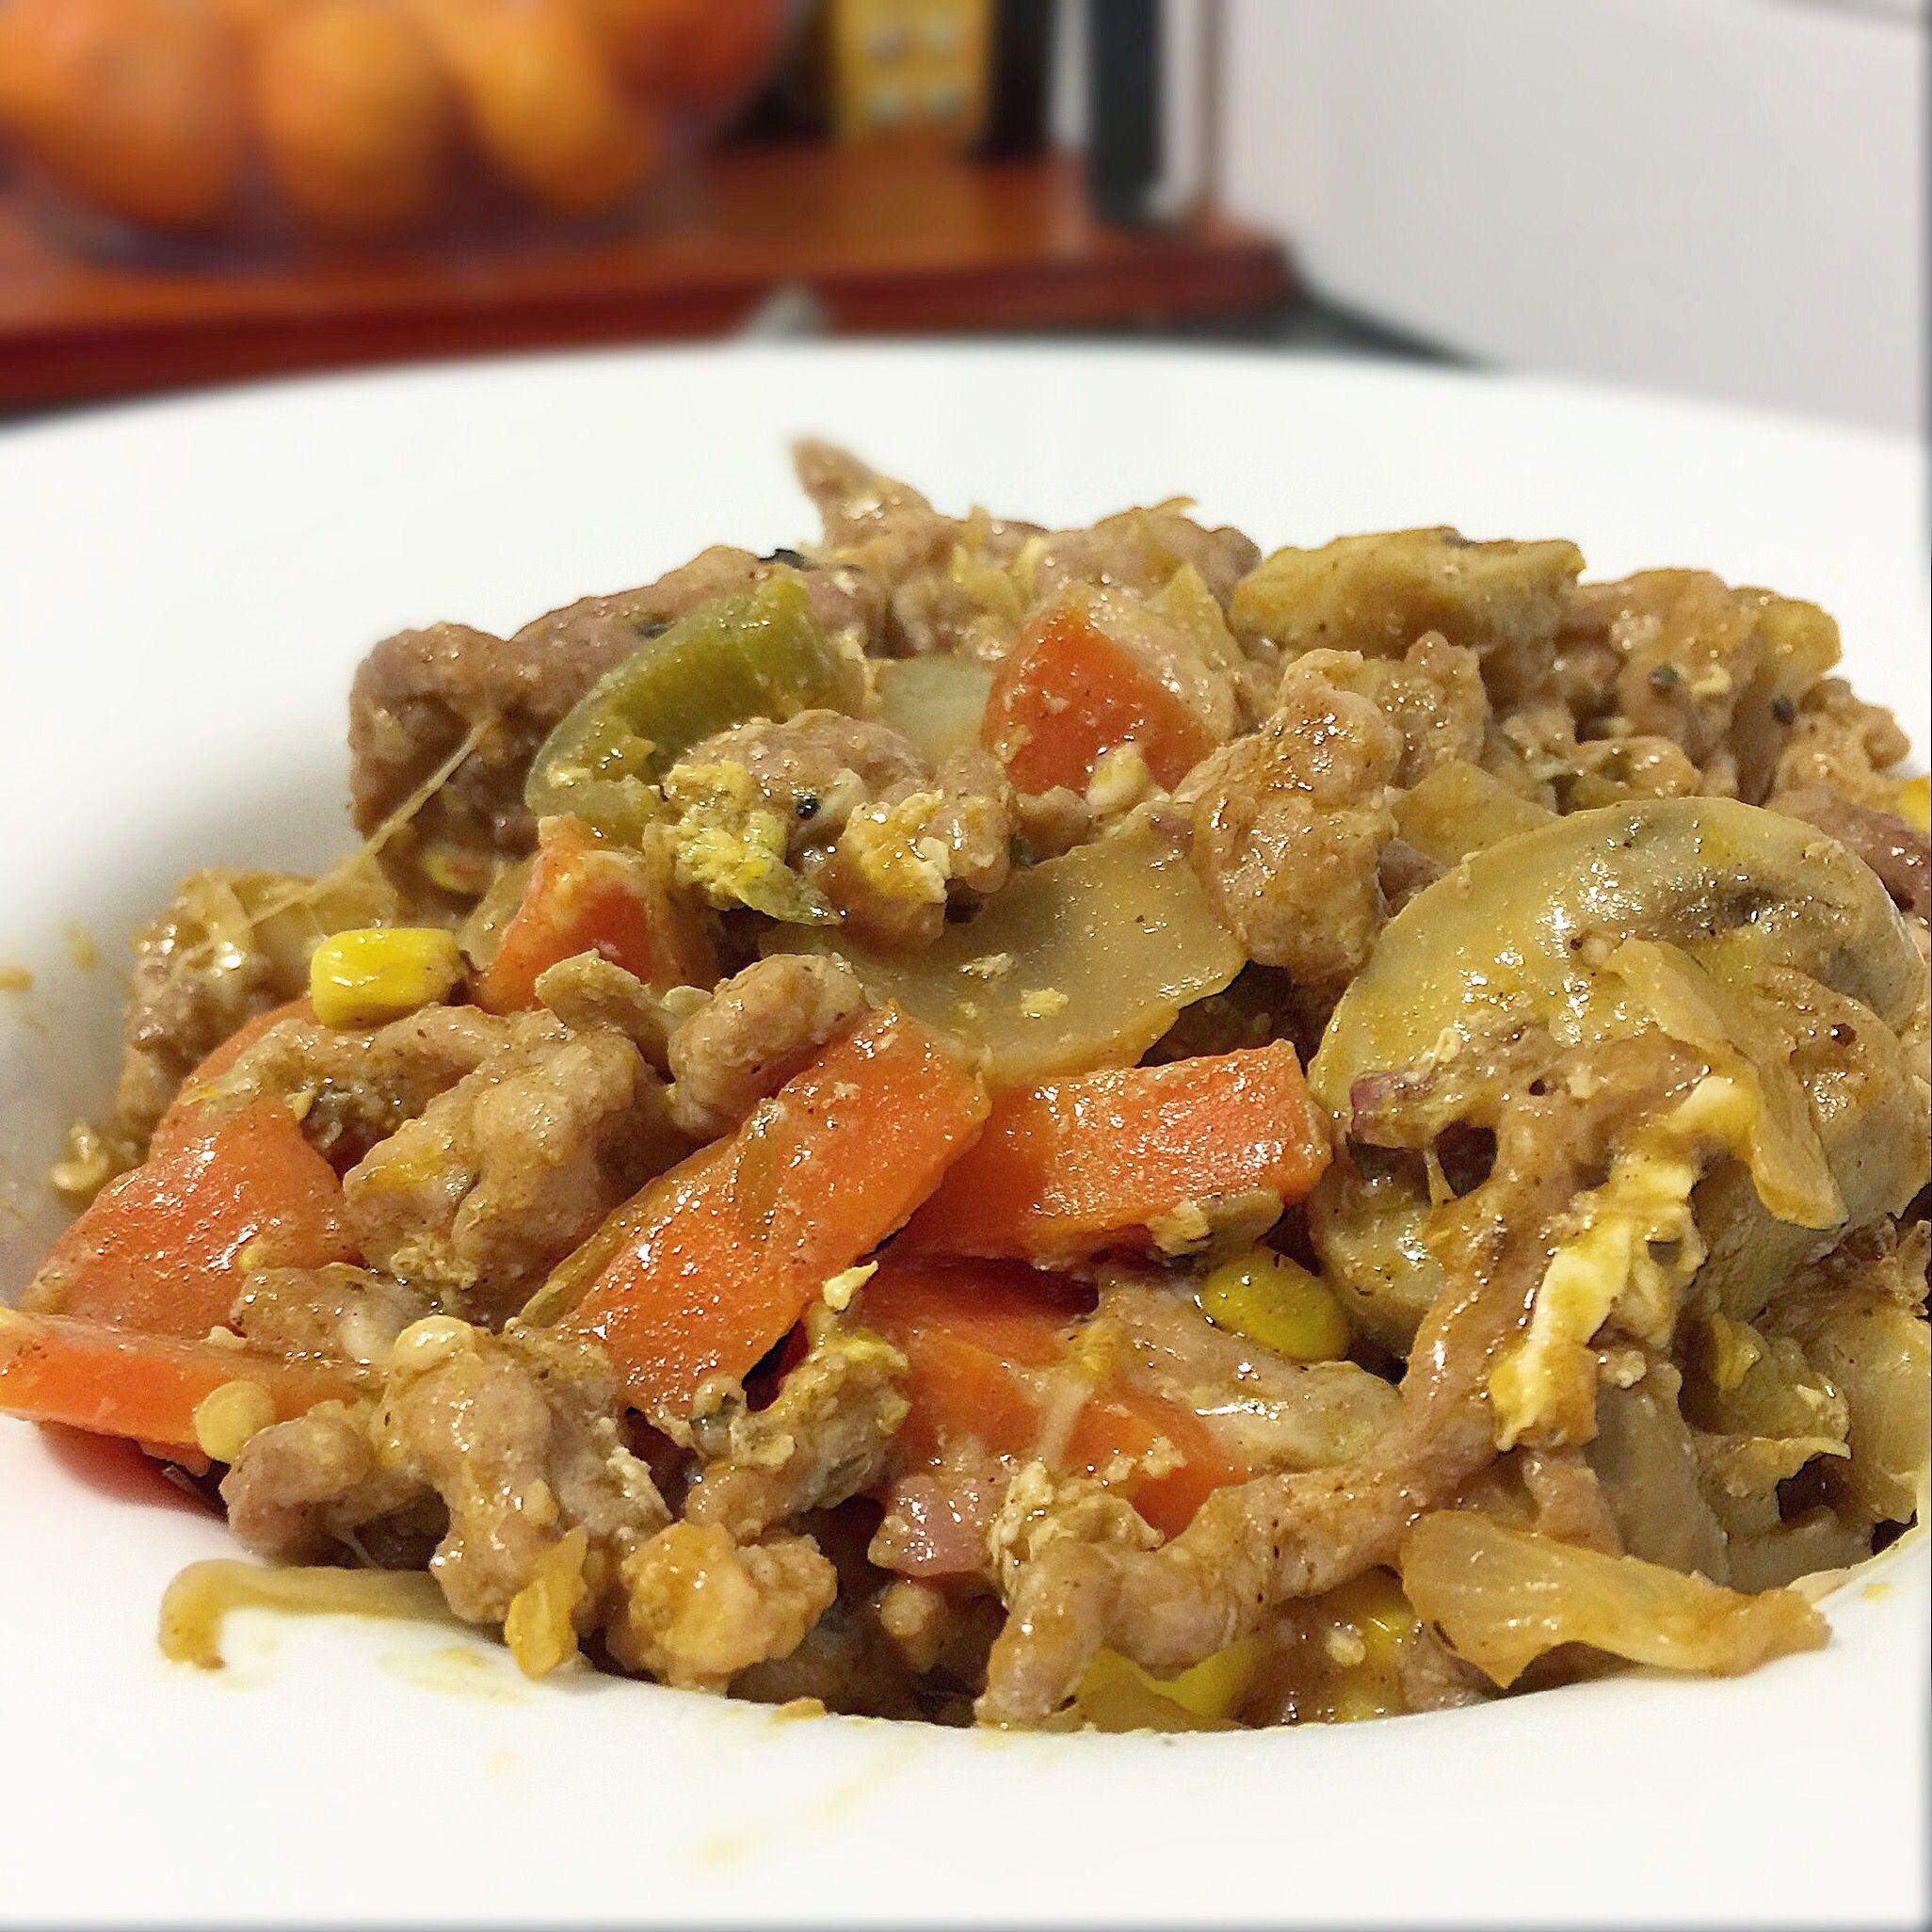 RECETA FITNESS/ Carne picada con salsa barbacoa y jalapeños